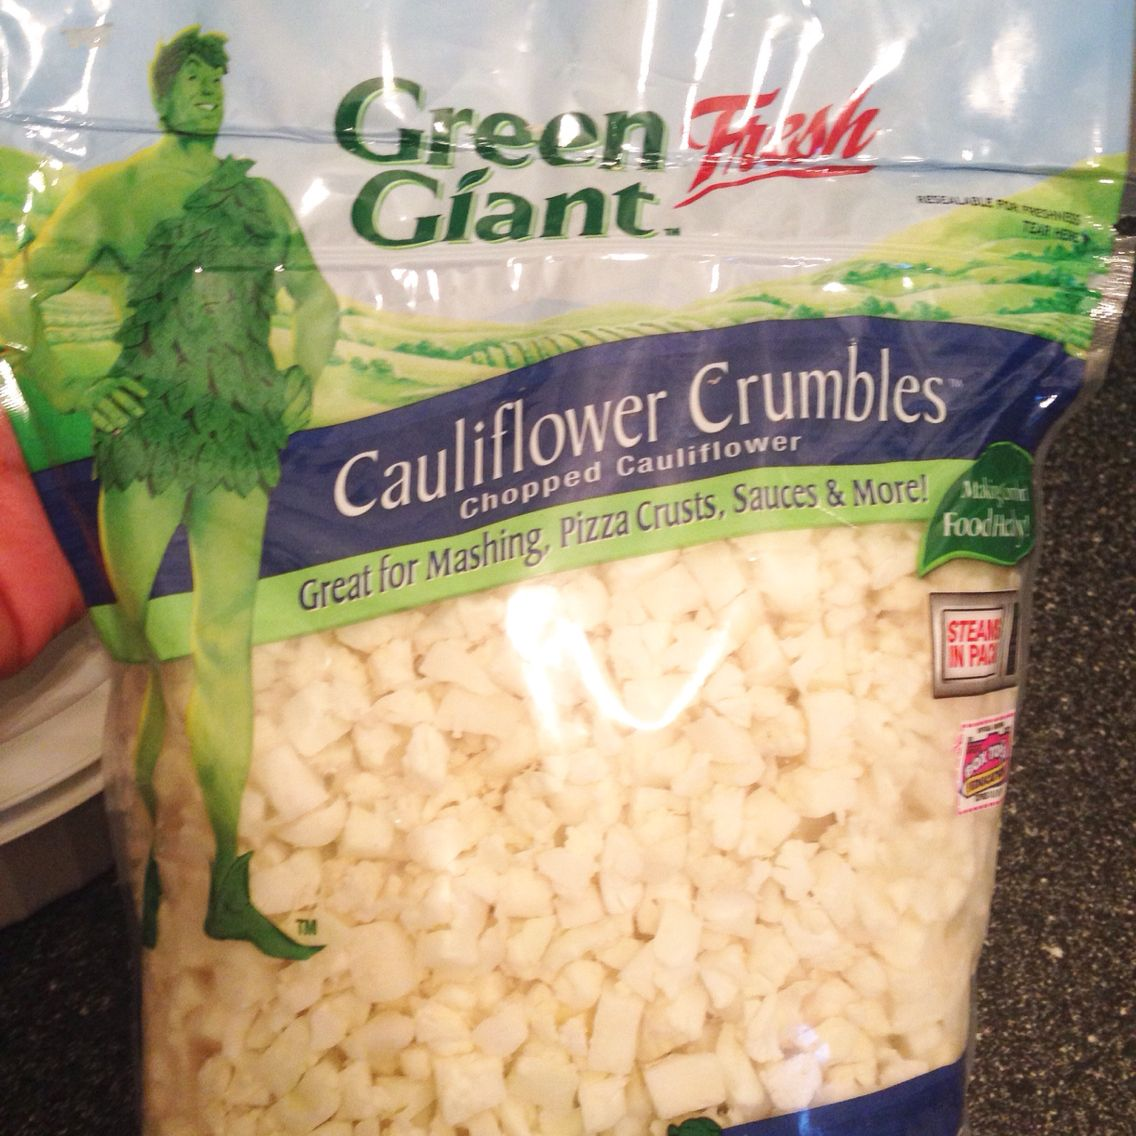 Cauliflower crumbles by Green Giant Fresh. Great